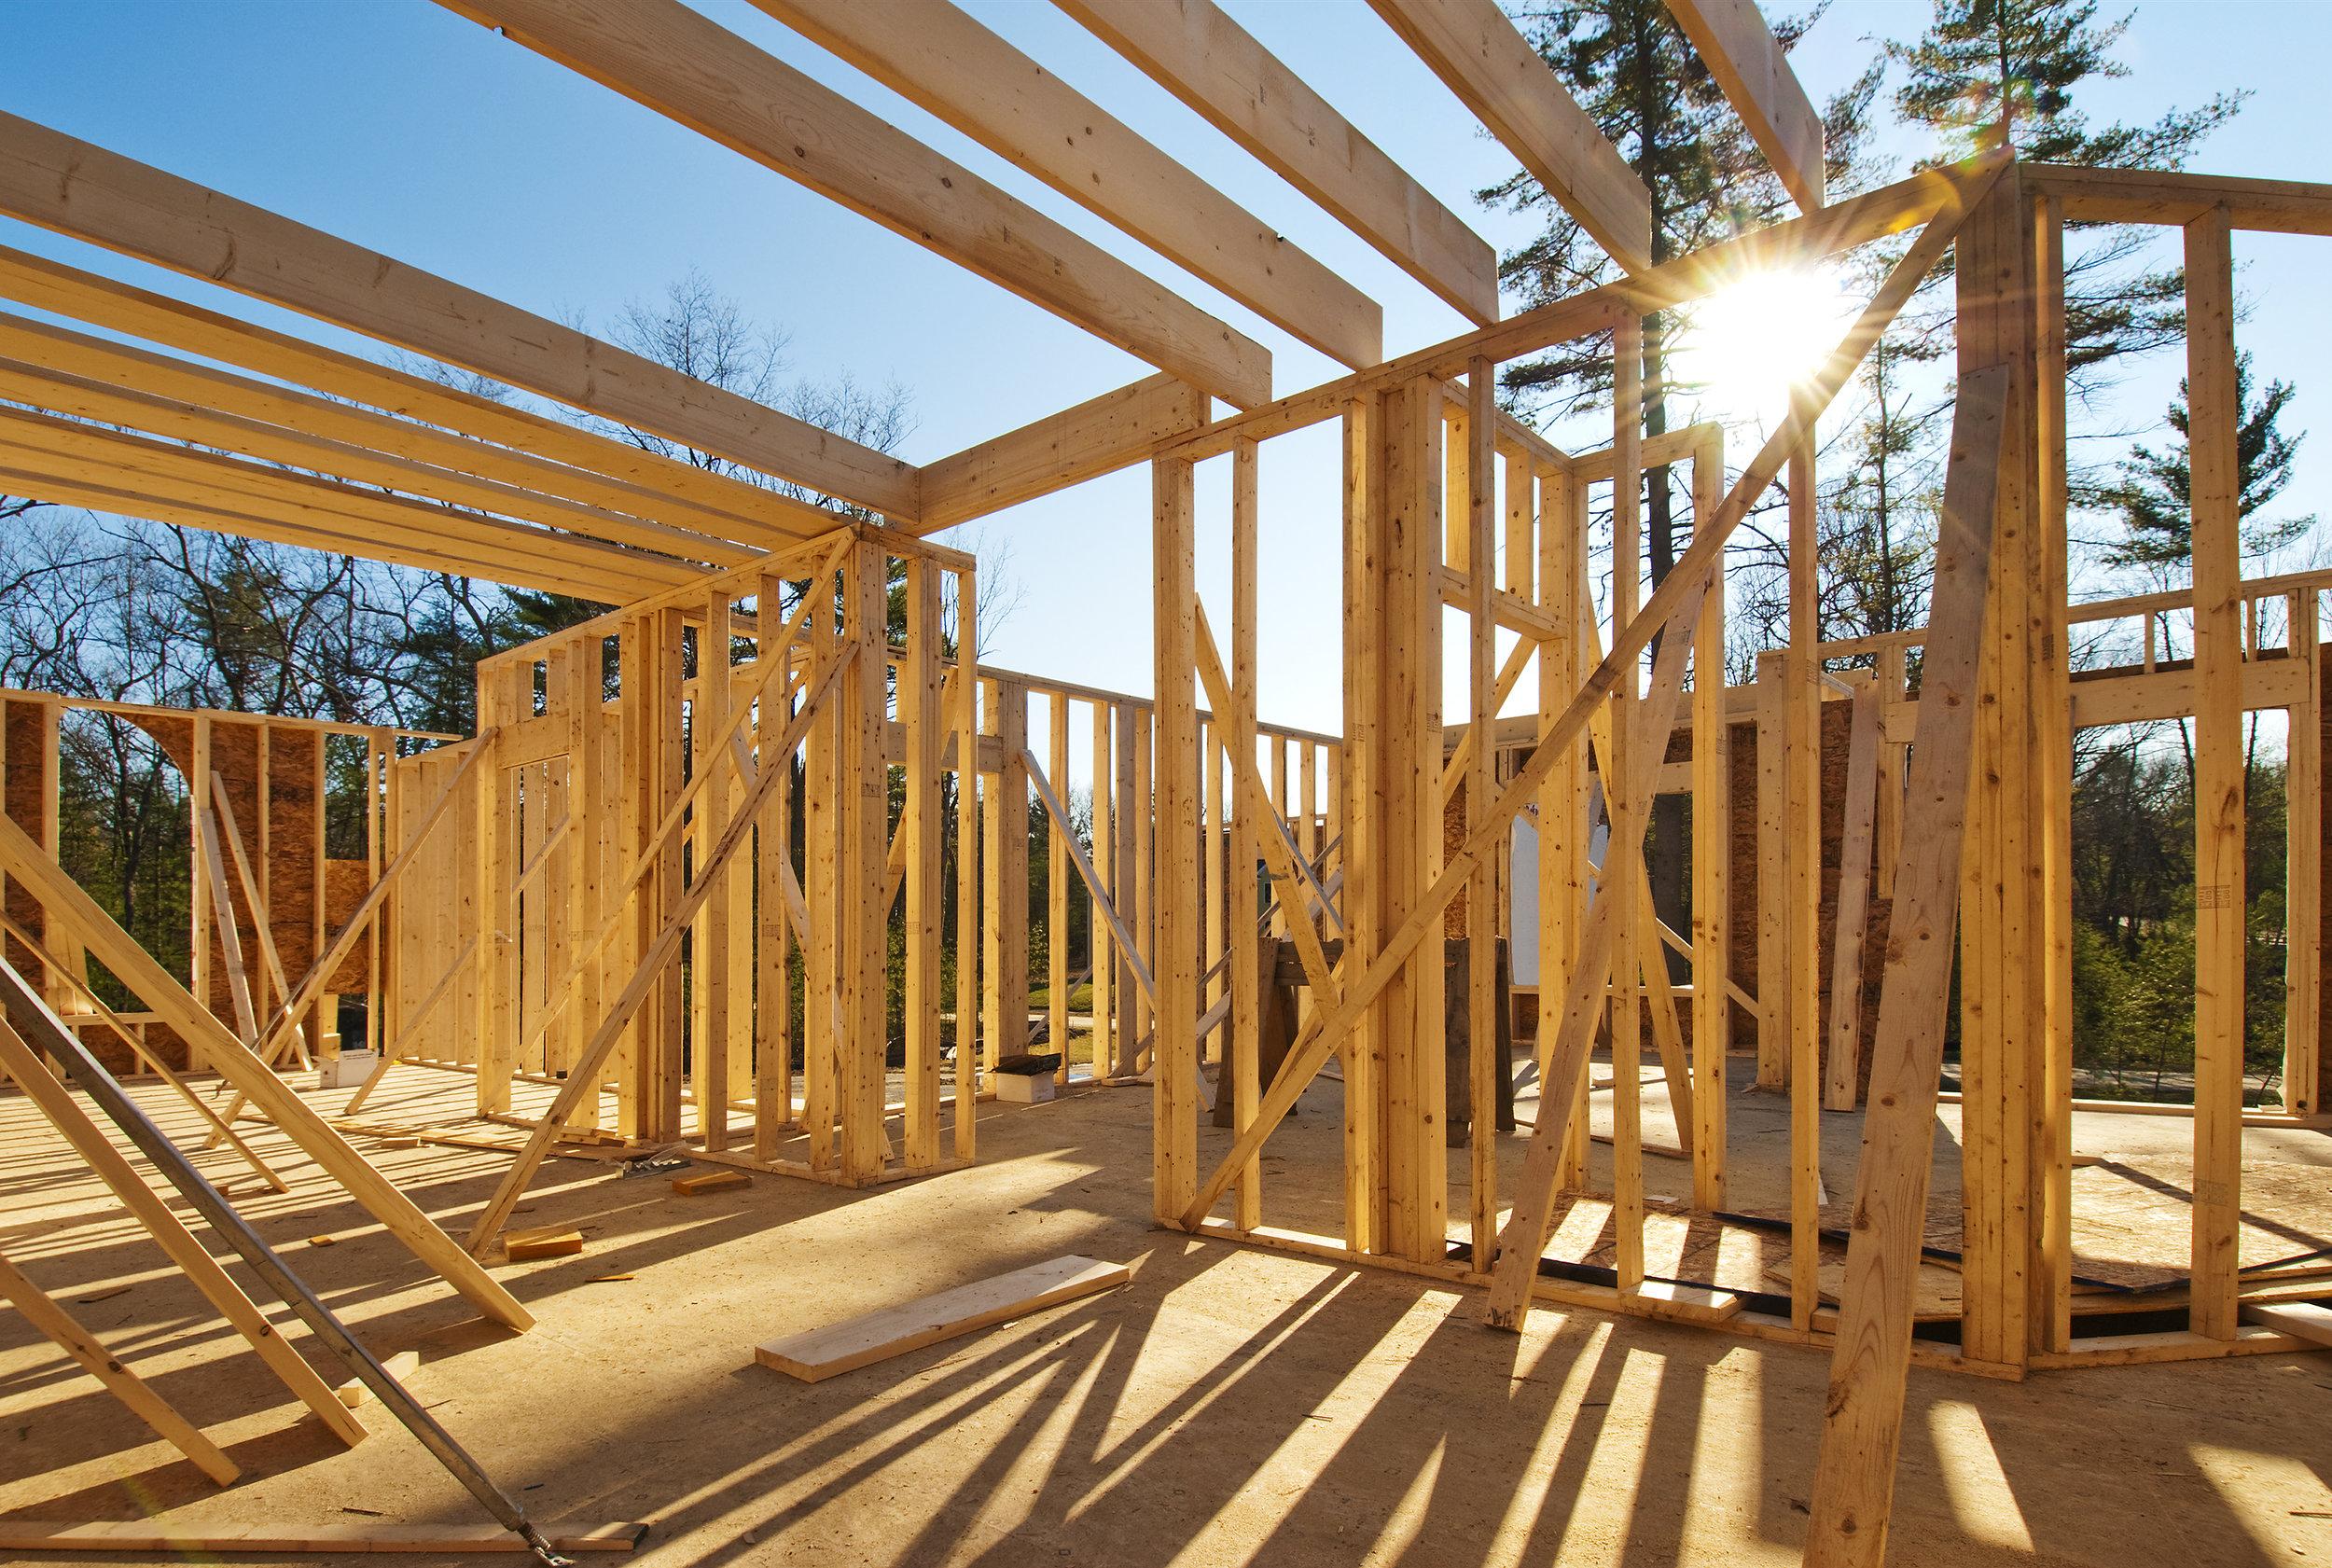 home-mbr-construction_building-a-new-home_home-design-magazine-interior-website-designer-photo-house-inside-architecture-and-decoration-best-dizain.jpg